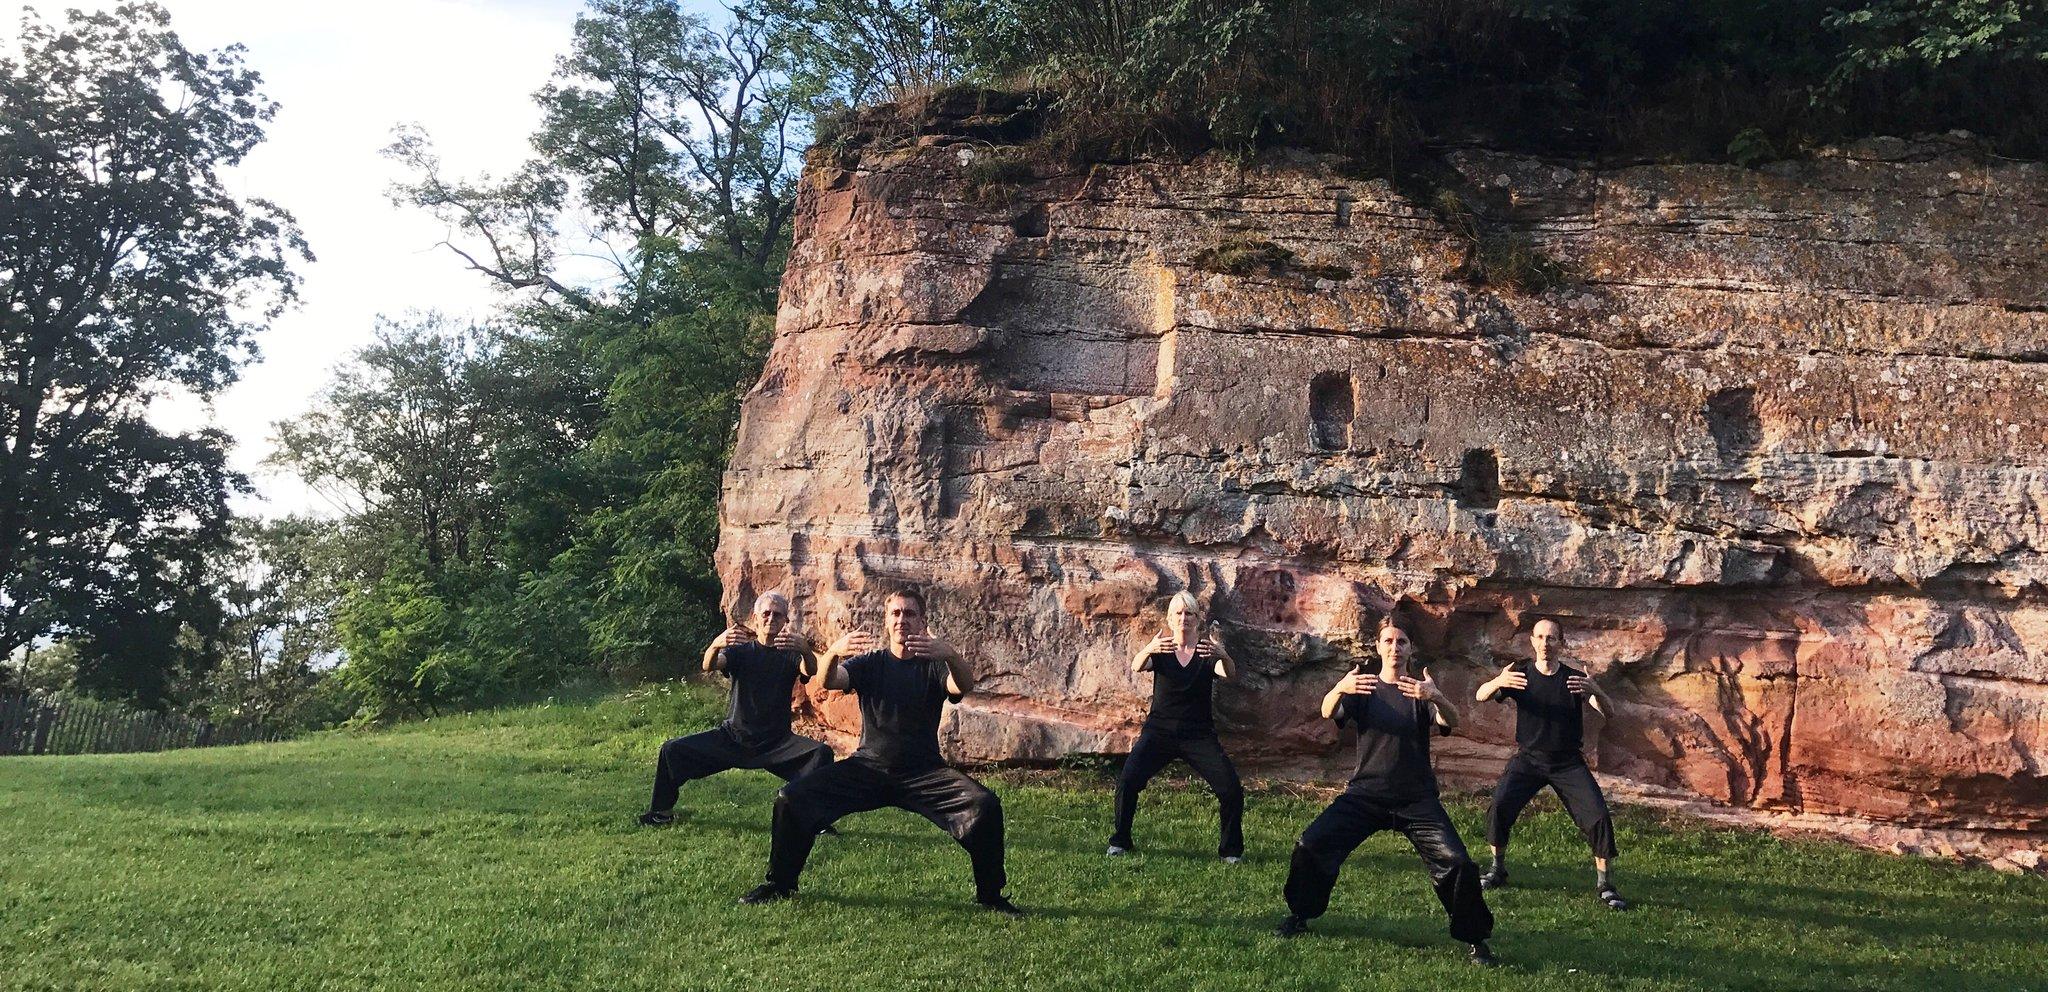 China-Kampfkunst e.V. Kaiserslautern: Mitmachtraining Qigong und ...